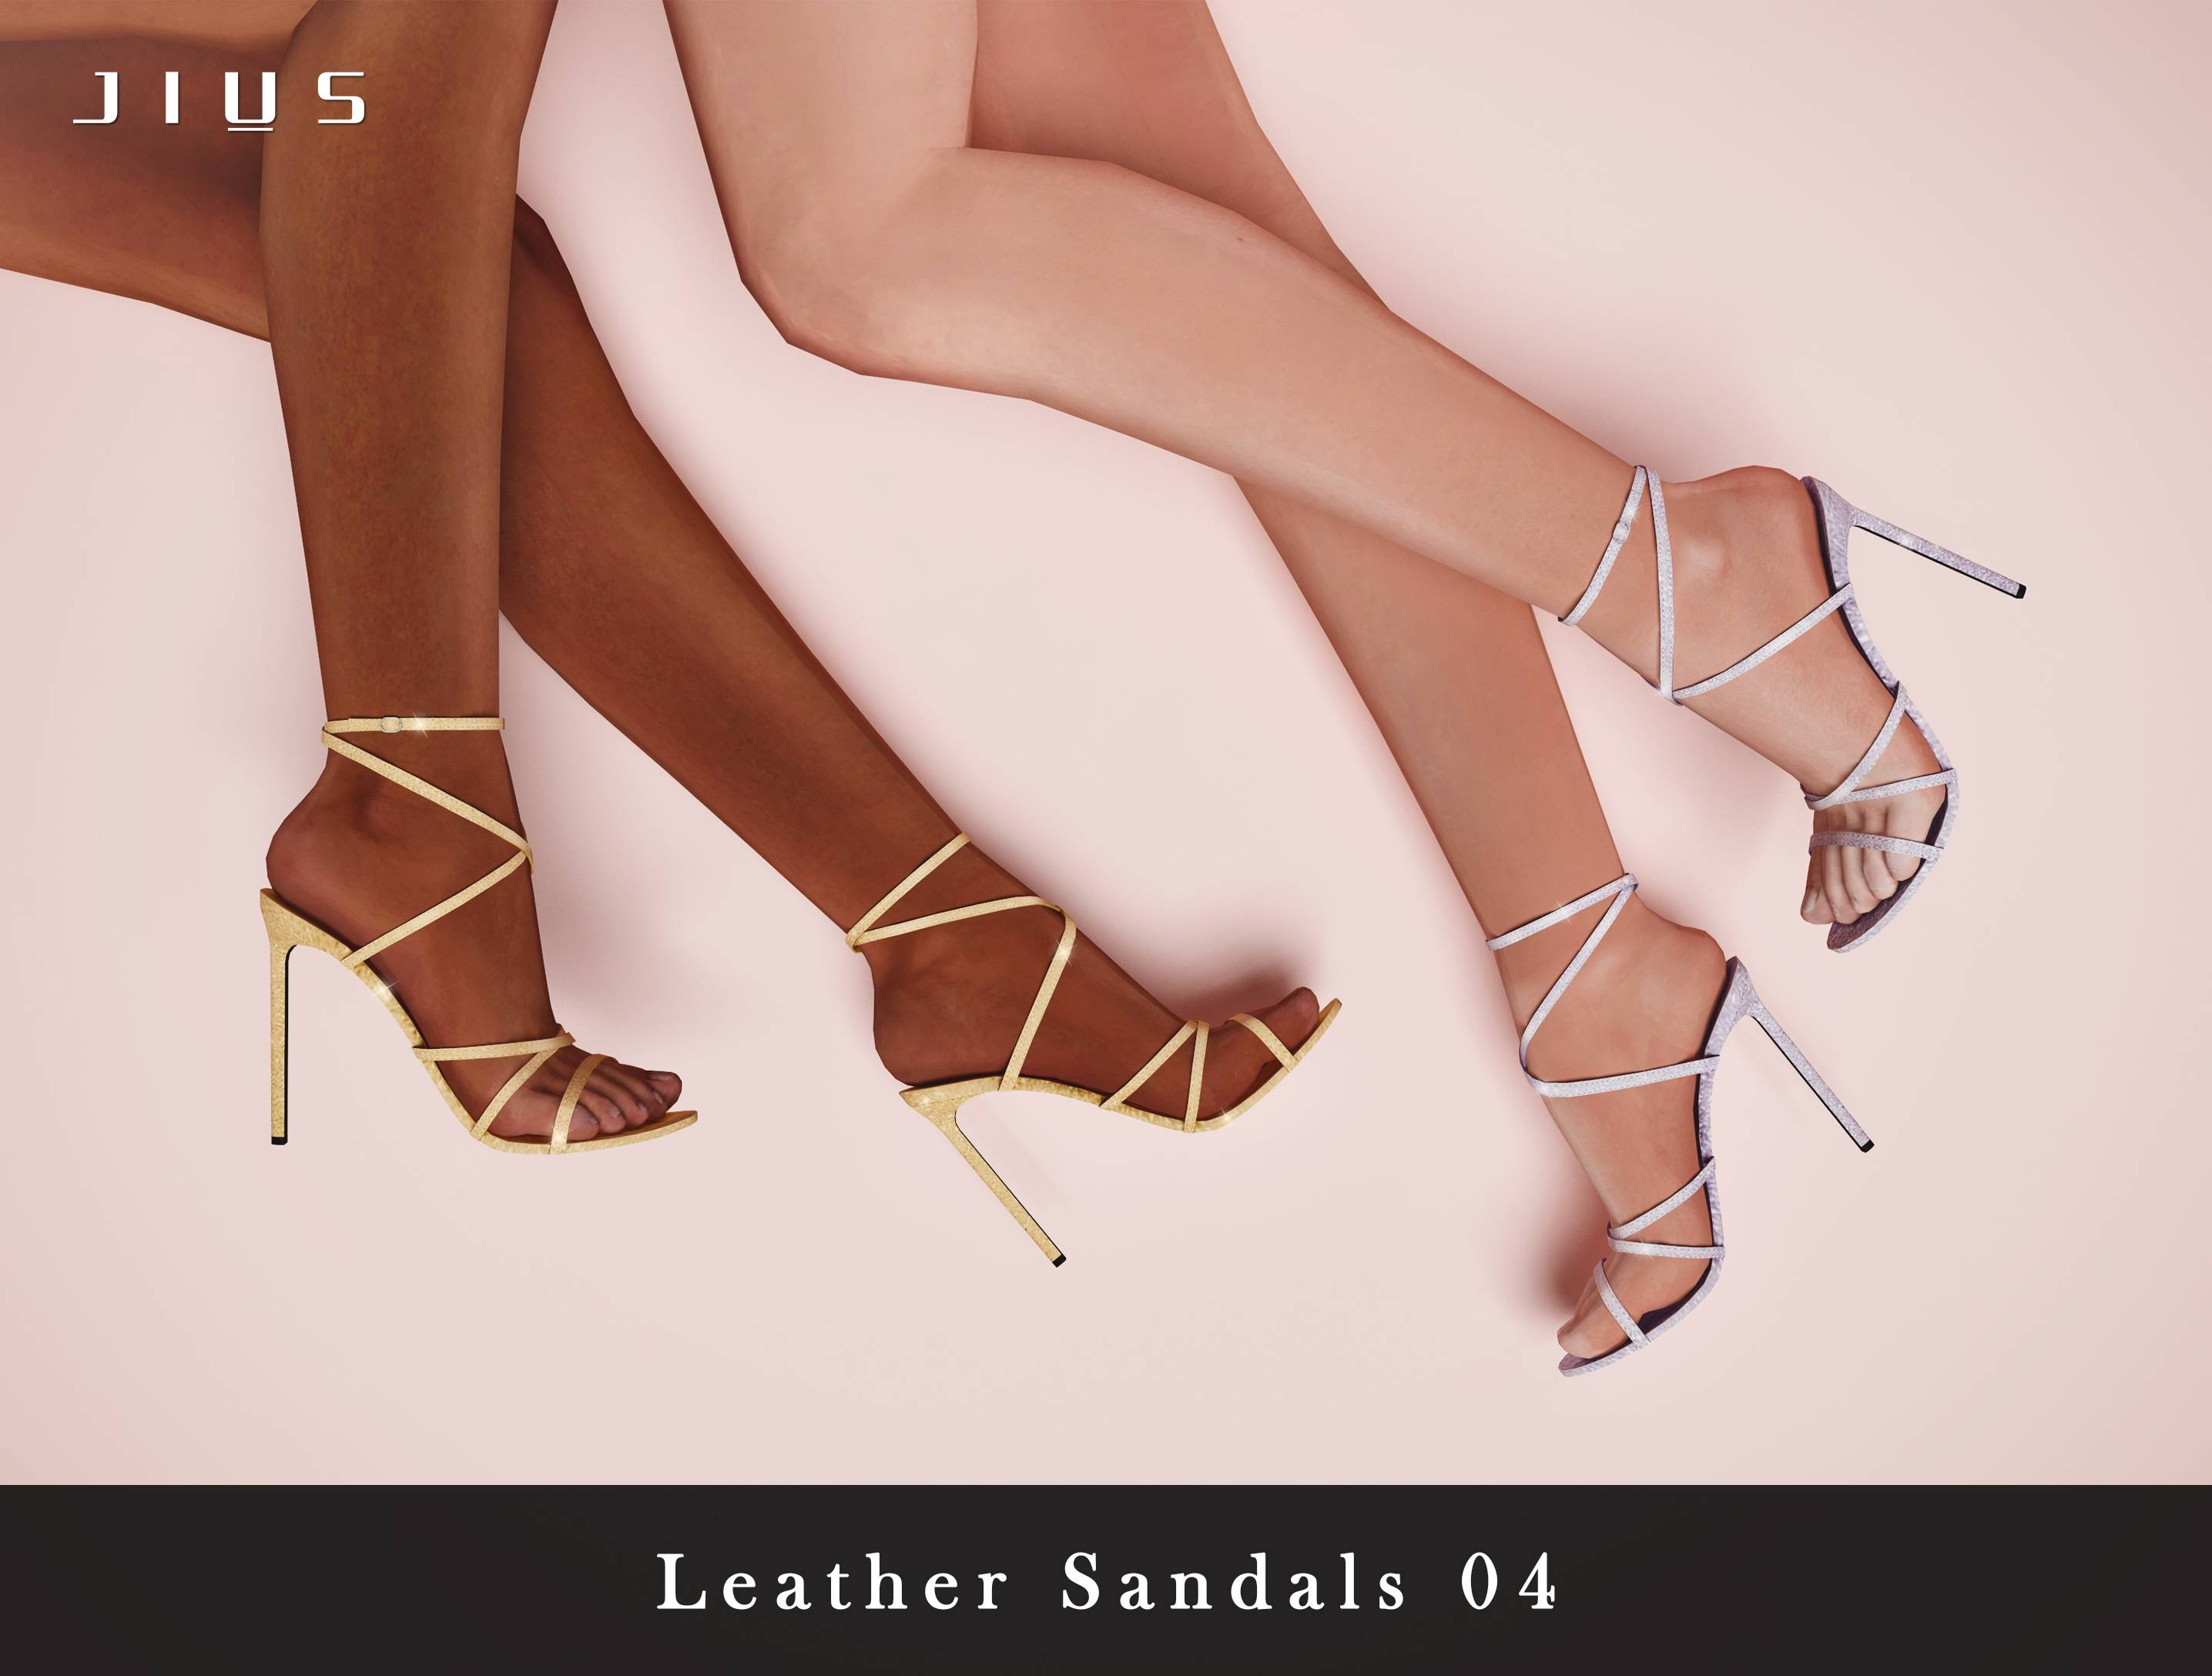 Босоножки - Leather Sandals 04